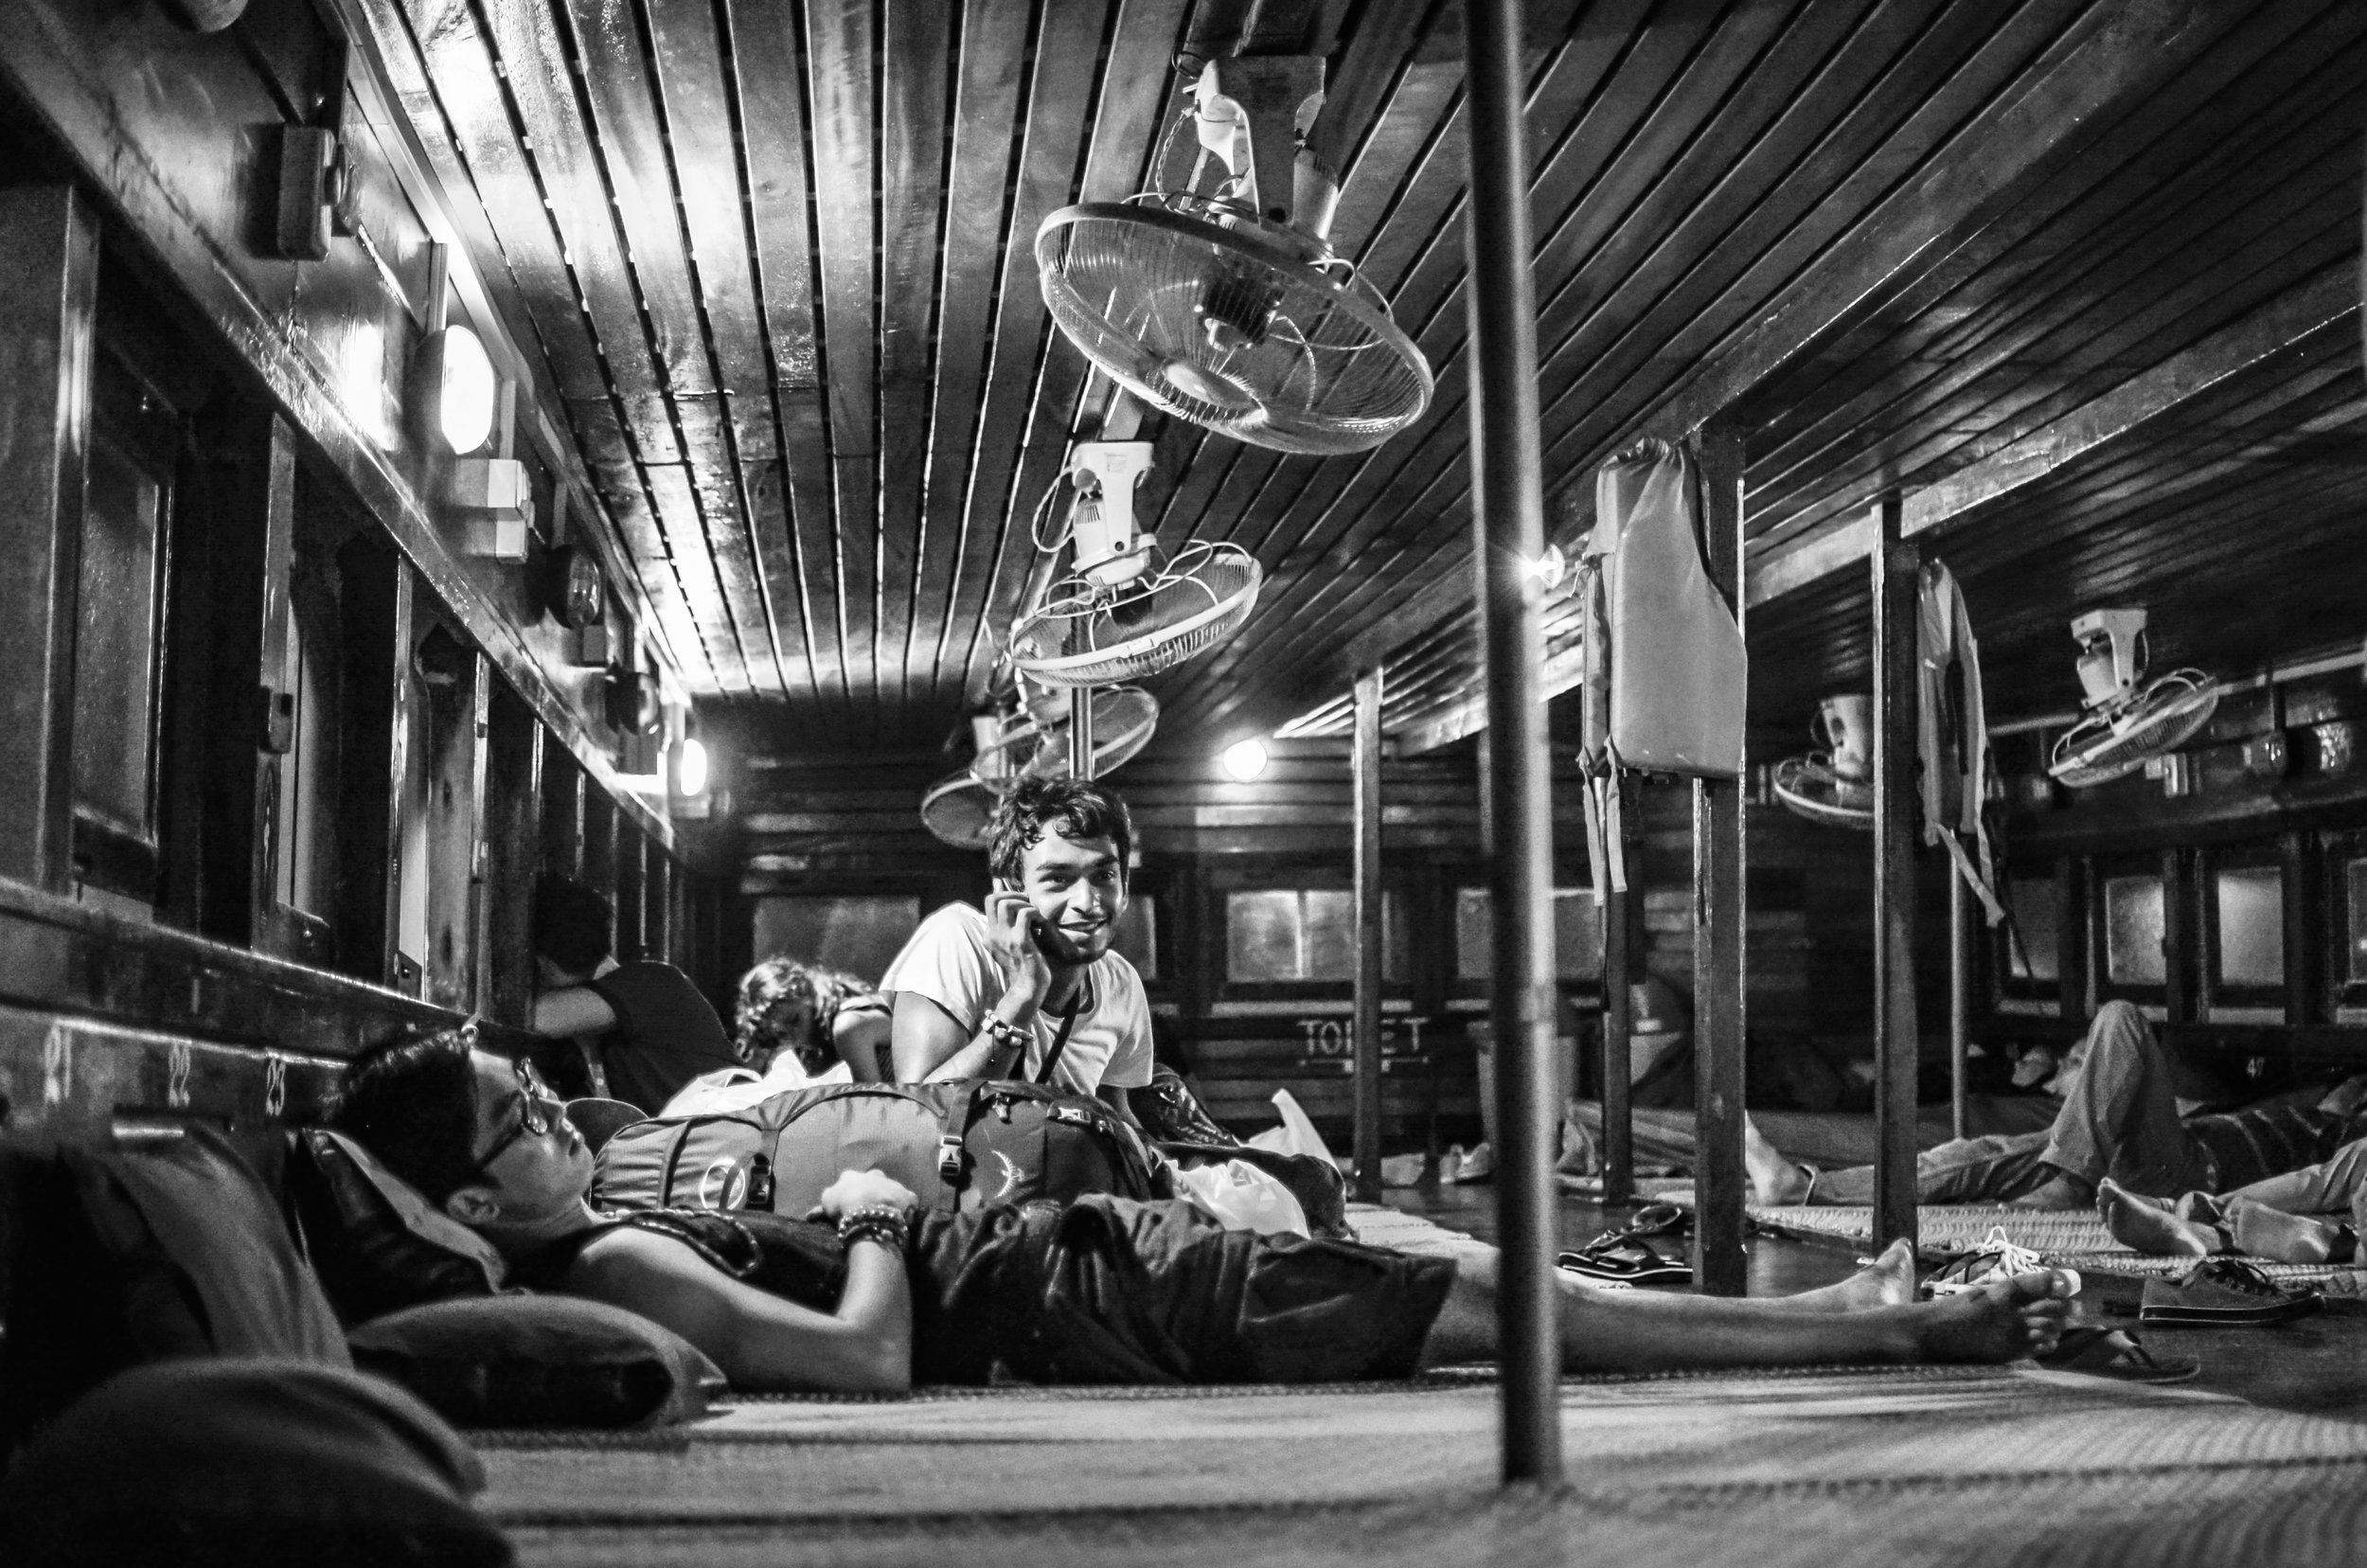 Night ferry in Koh Samui, Thailand